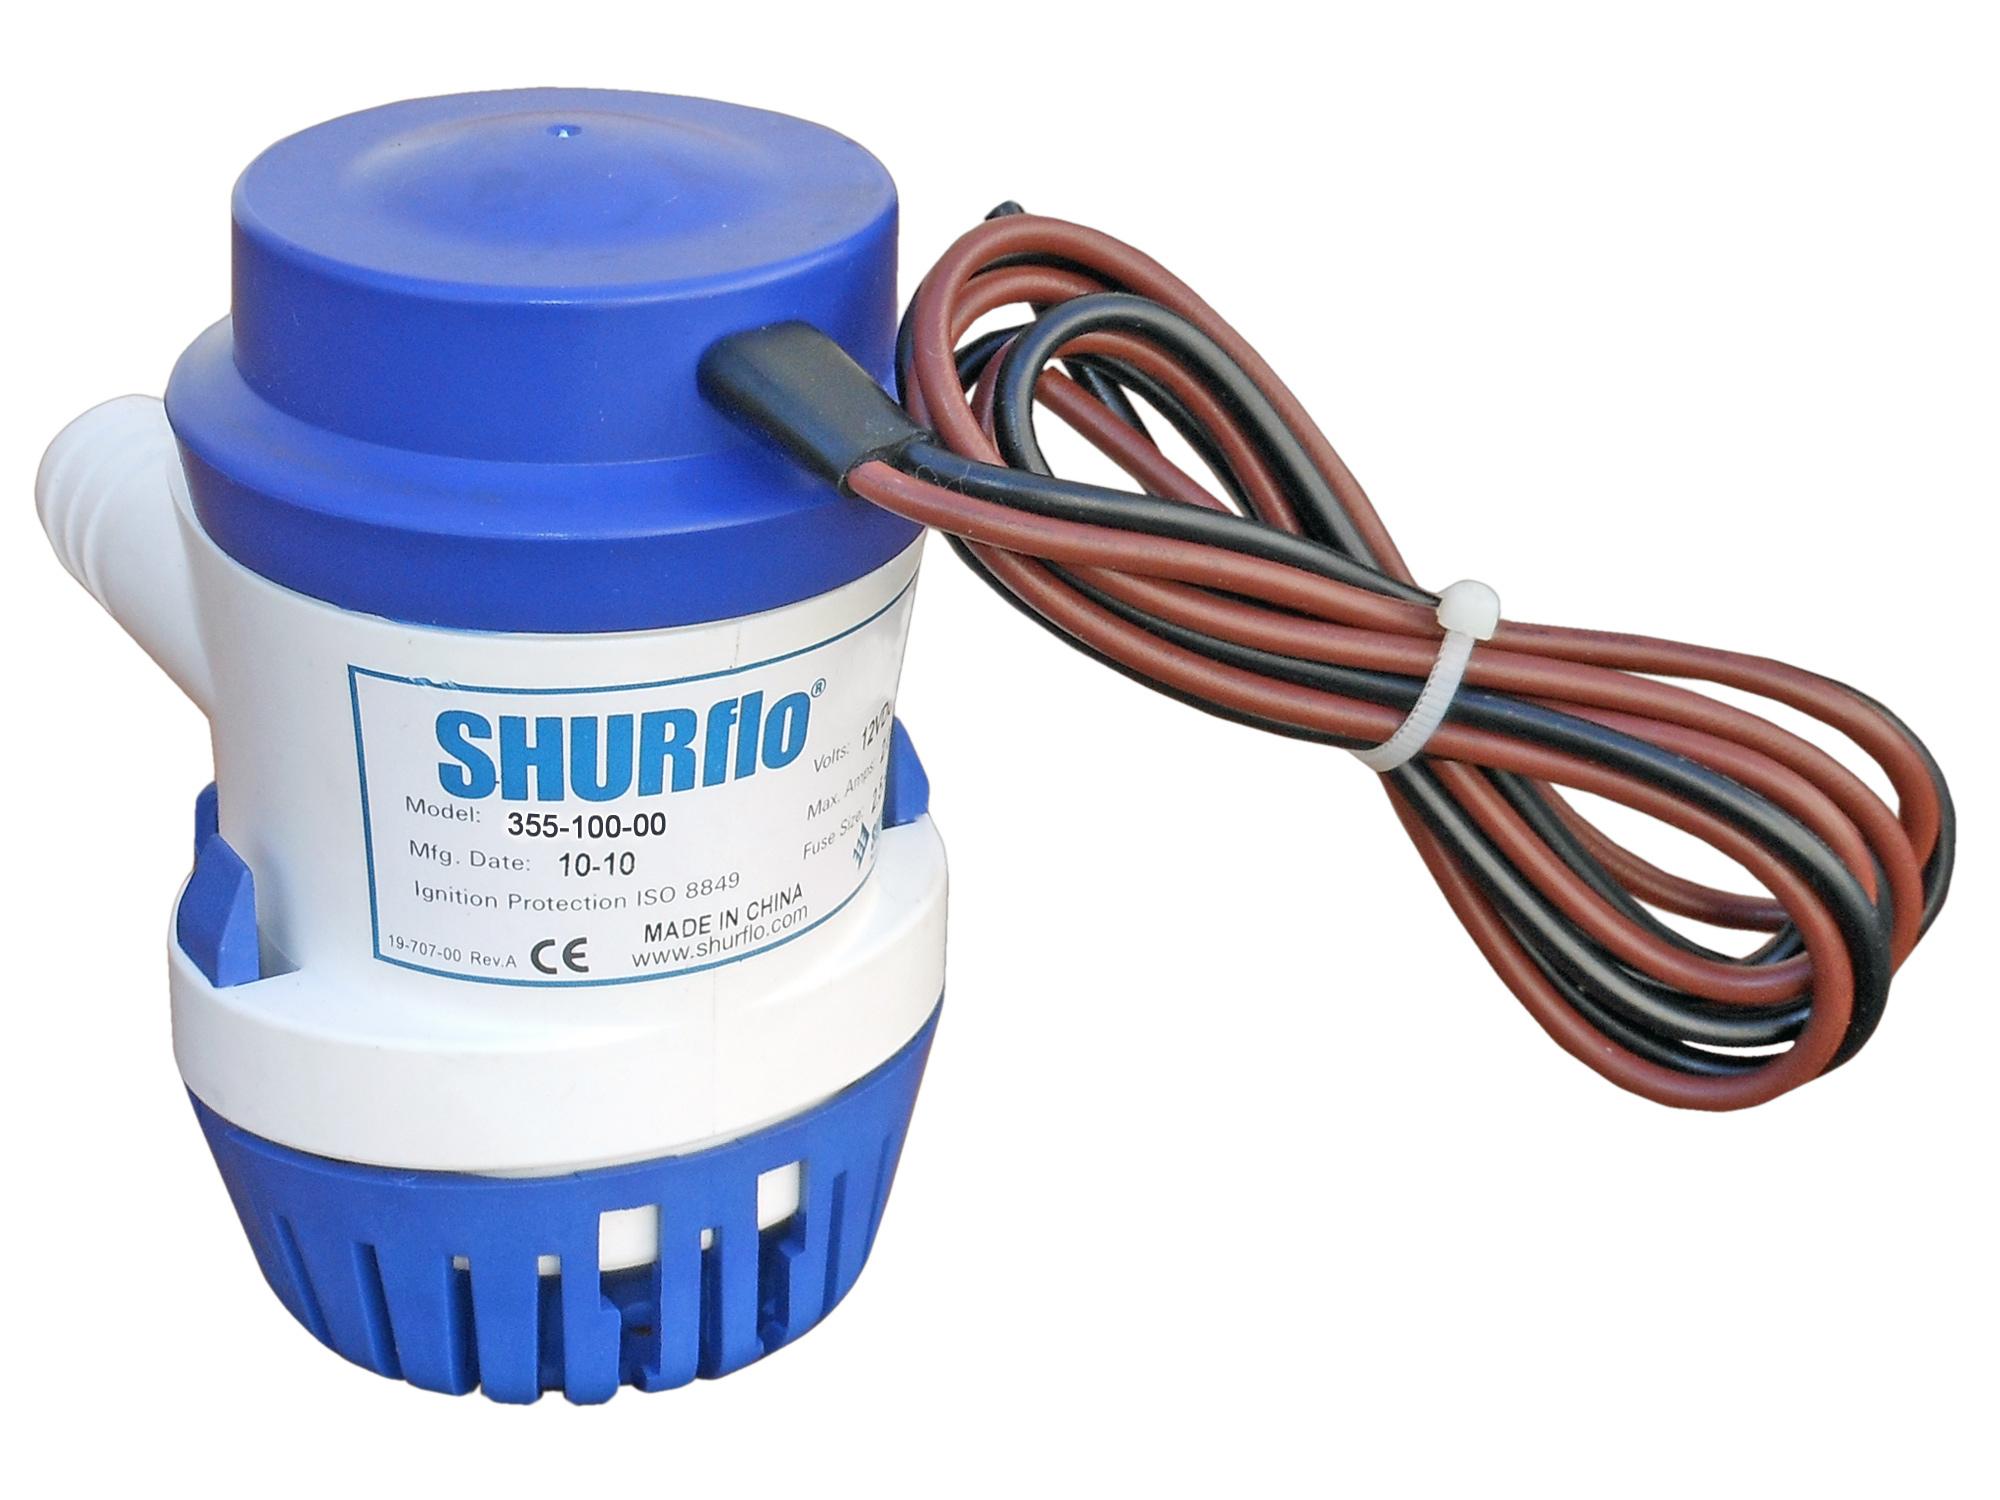 Marine Electric Bilge Pump for Boats Caravan & Rv-1000 Gph 12v Shurflo by